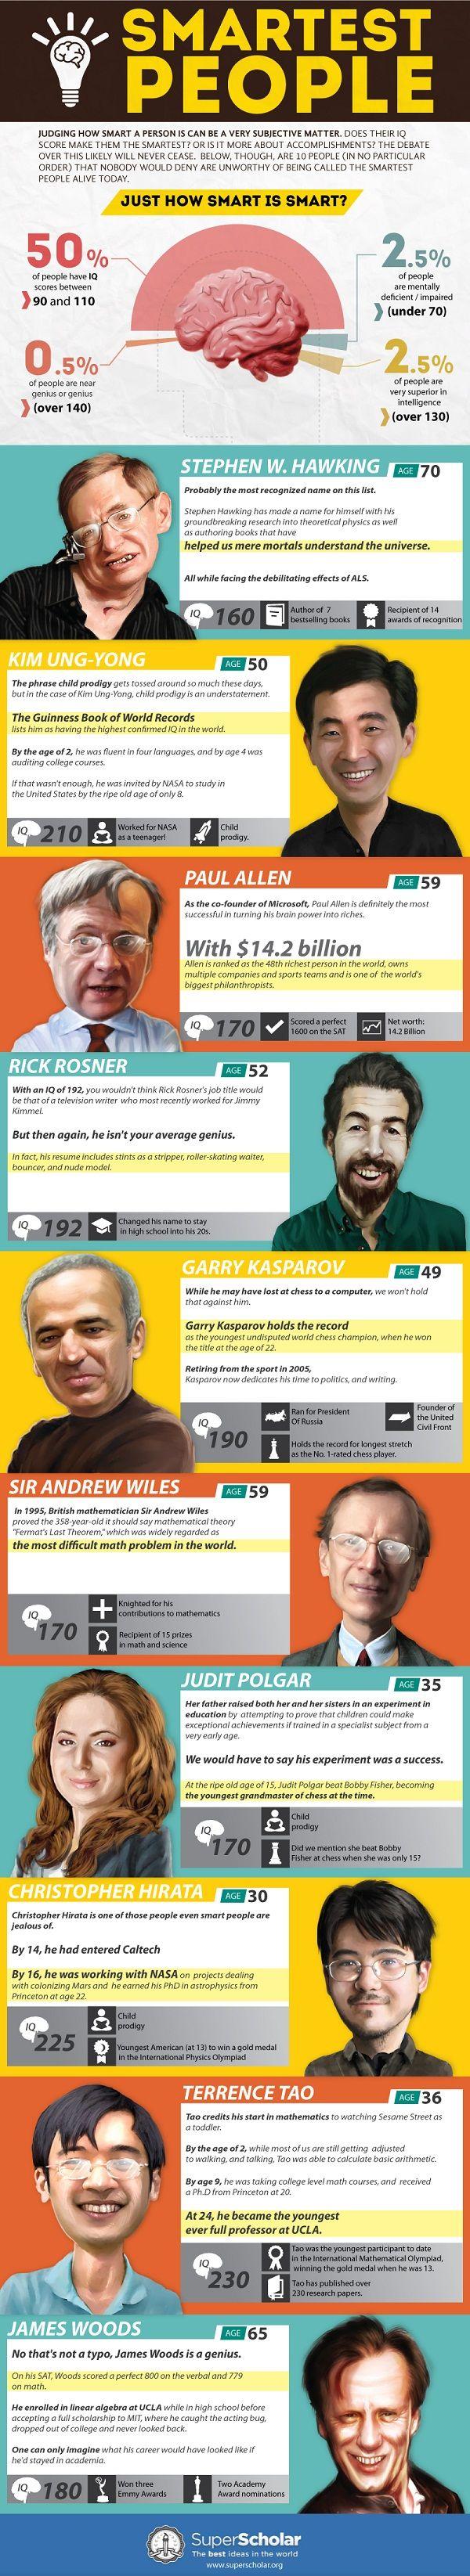 10 smartest people #infographic: Smartest People, Smart People, Stuff, Más Inteligentes, 10 Smartest, People Alive, Interesting, Infographics, Highest Iqs